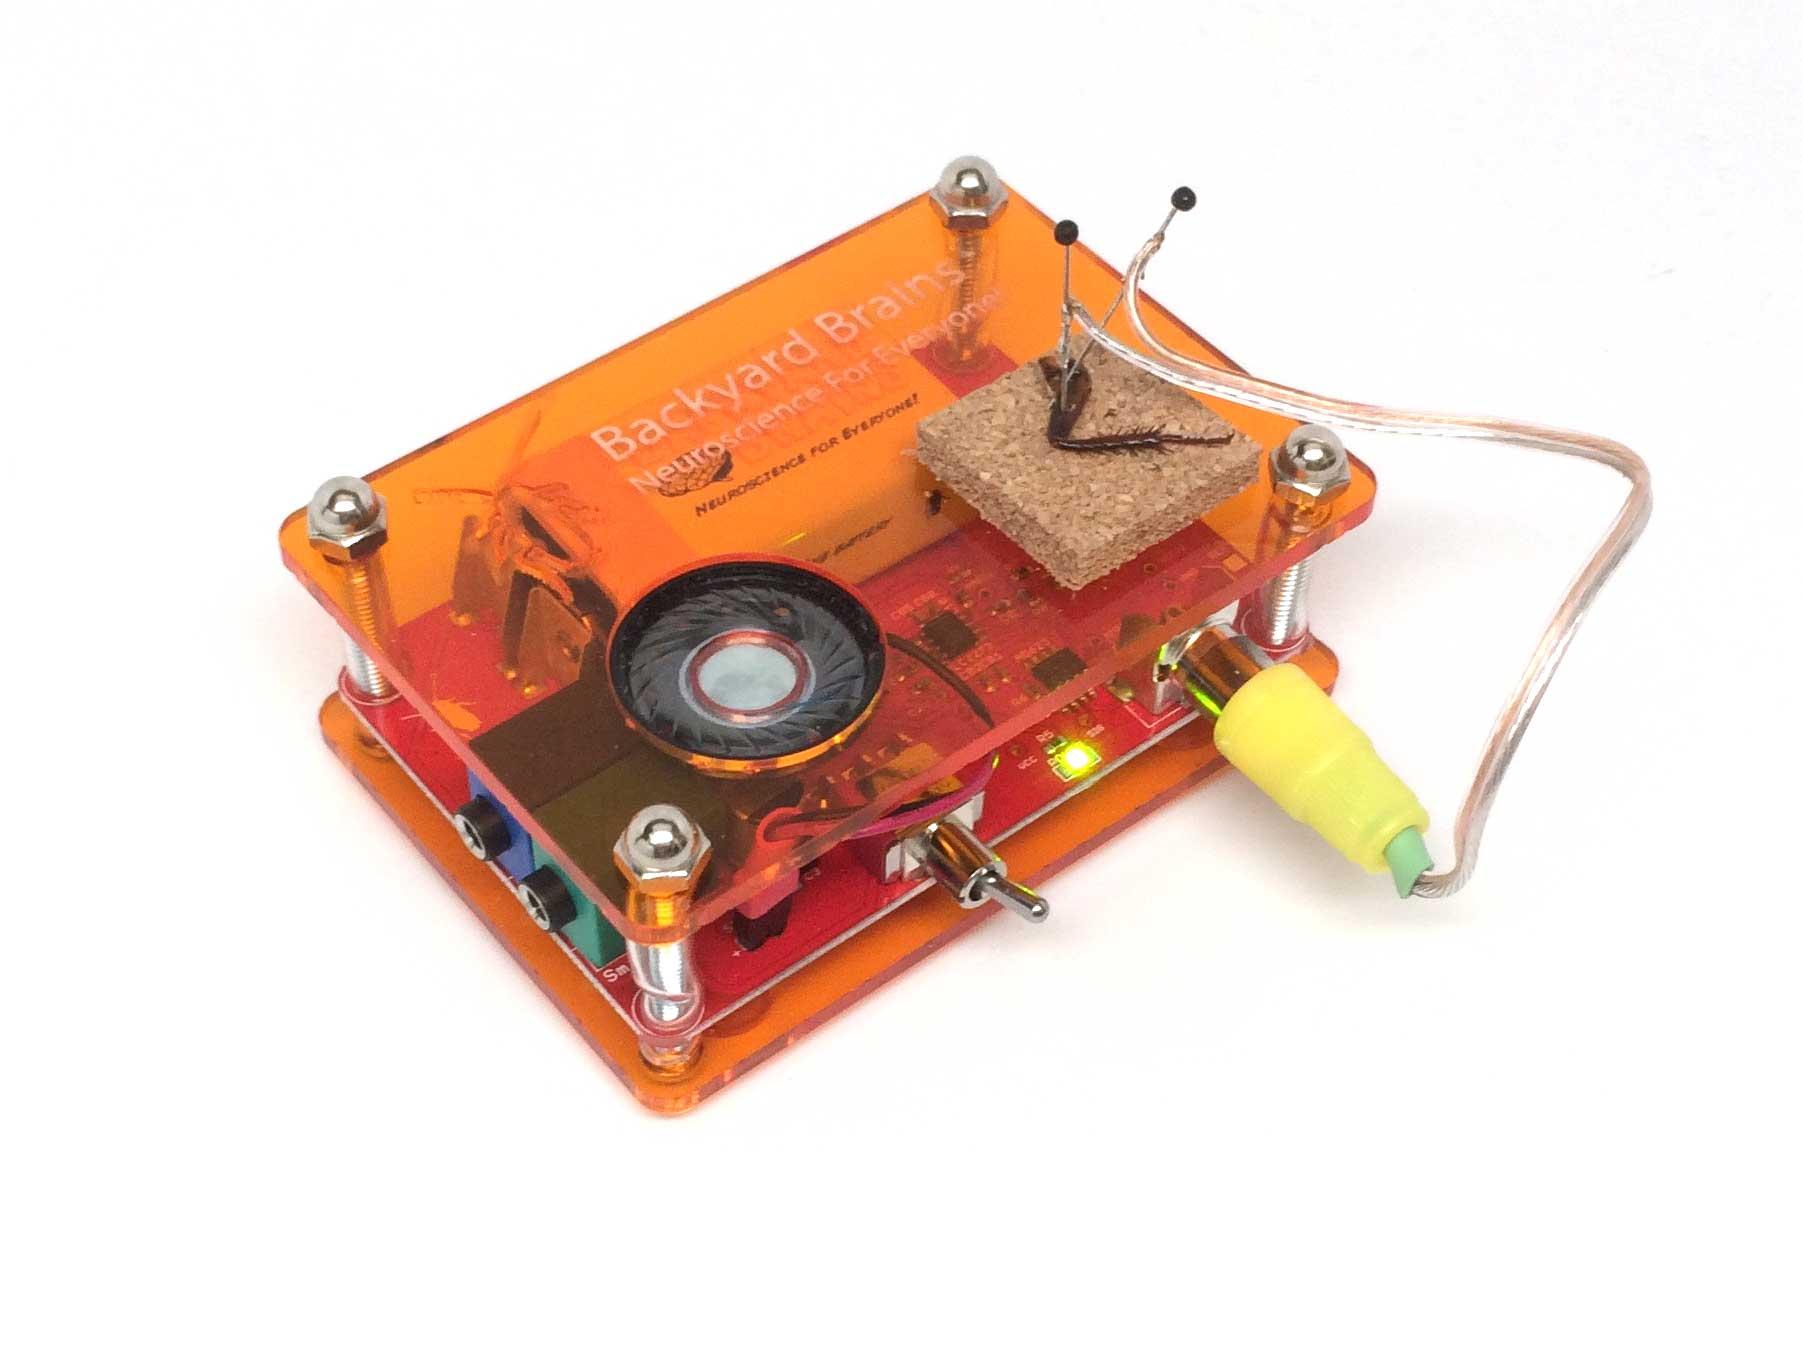 Neuron Spikerbox Chargecompensatedsampleandhold Amplifiercircuit Circuit